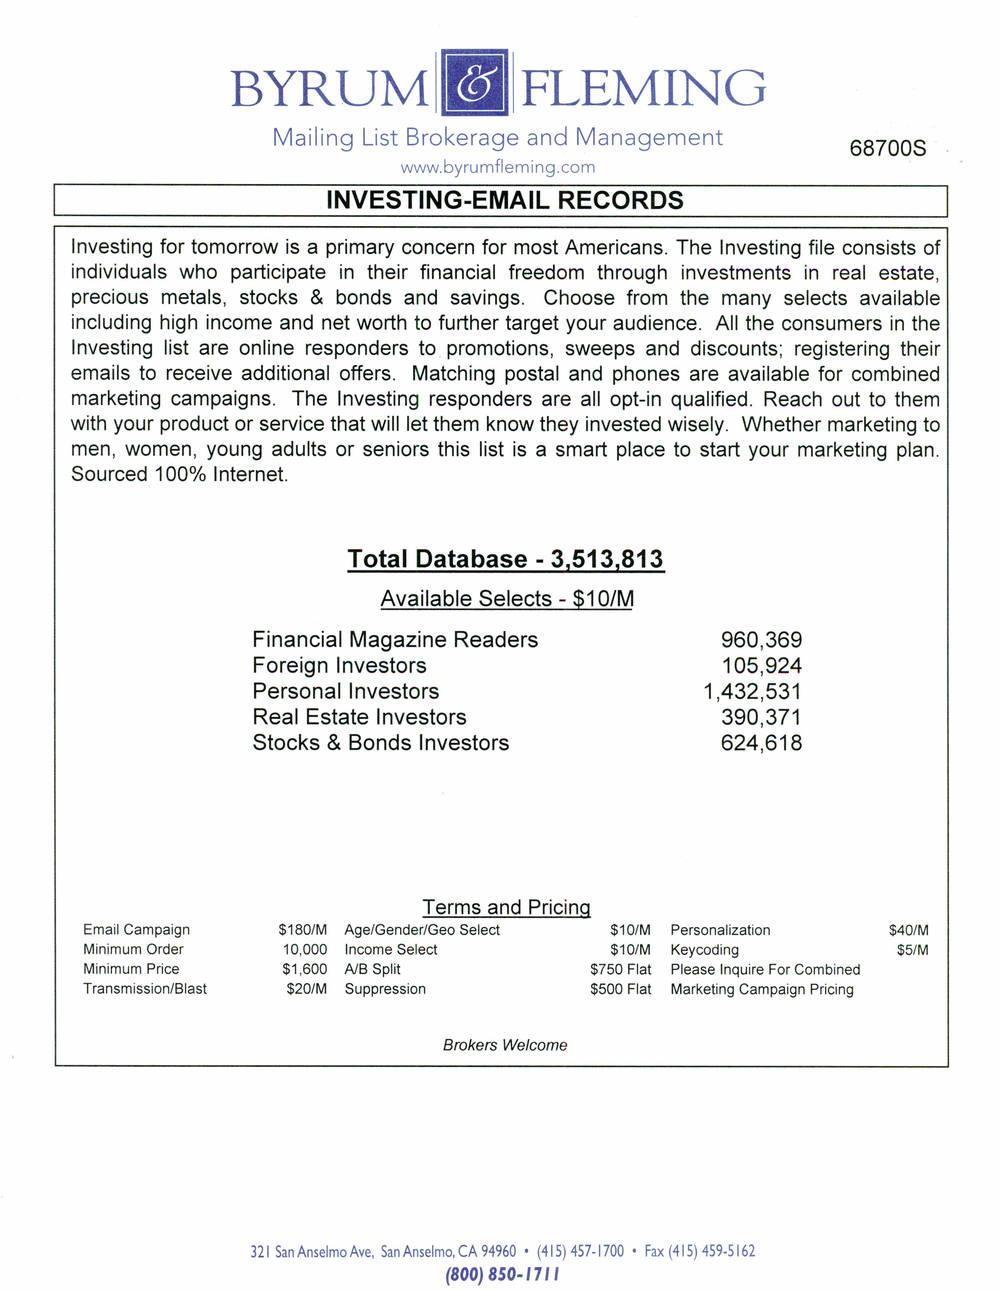 Financial Magazine Readers Foreign Investors Personal Investors Real Estate Investors Stocks & Bonds Investors